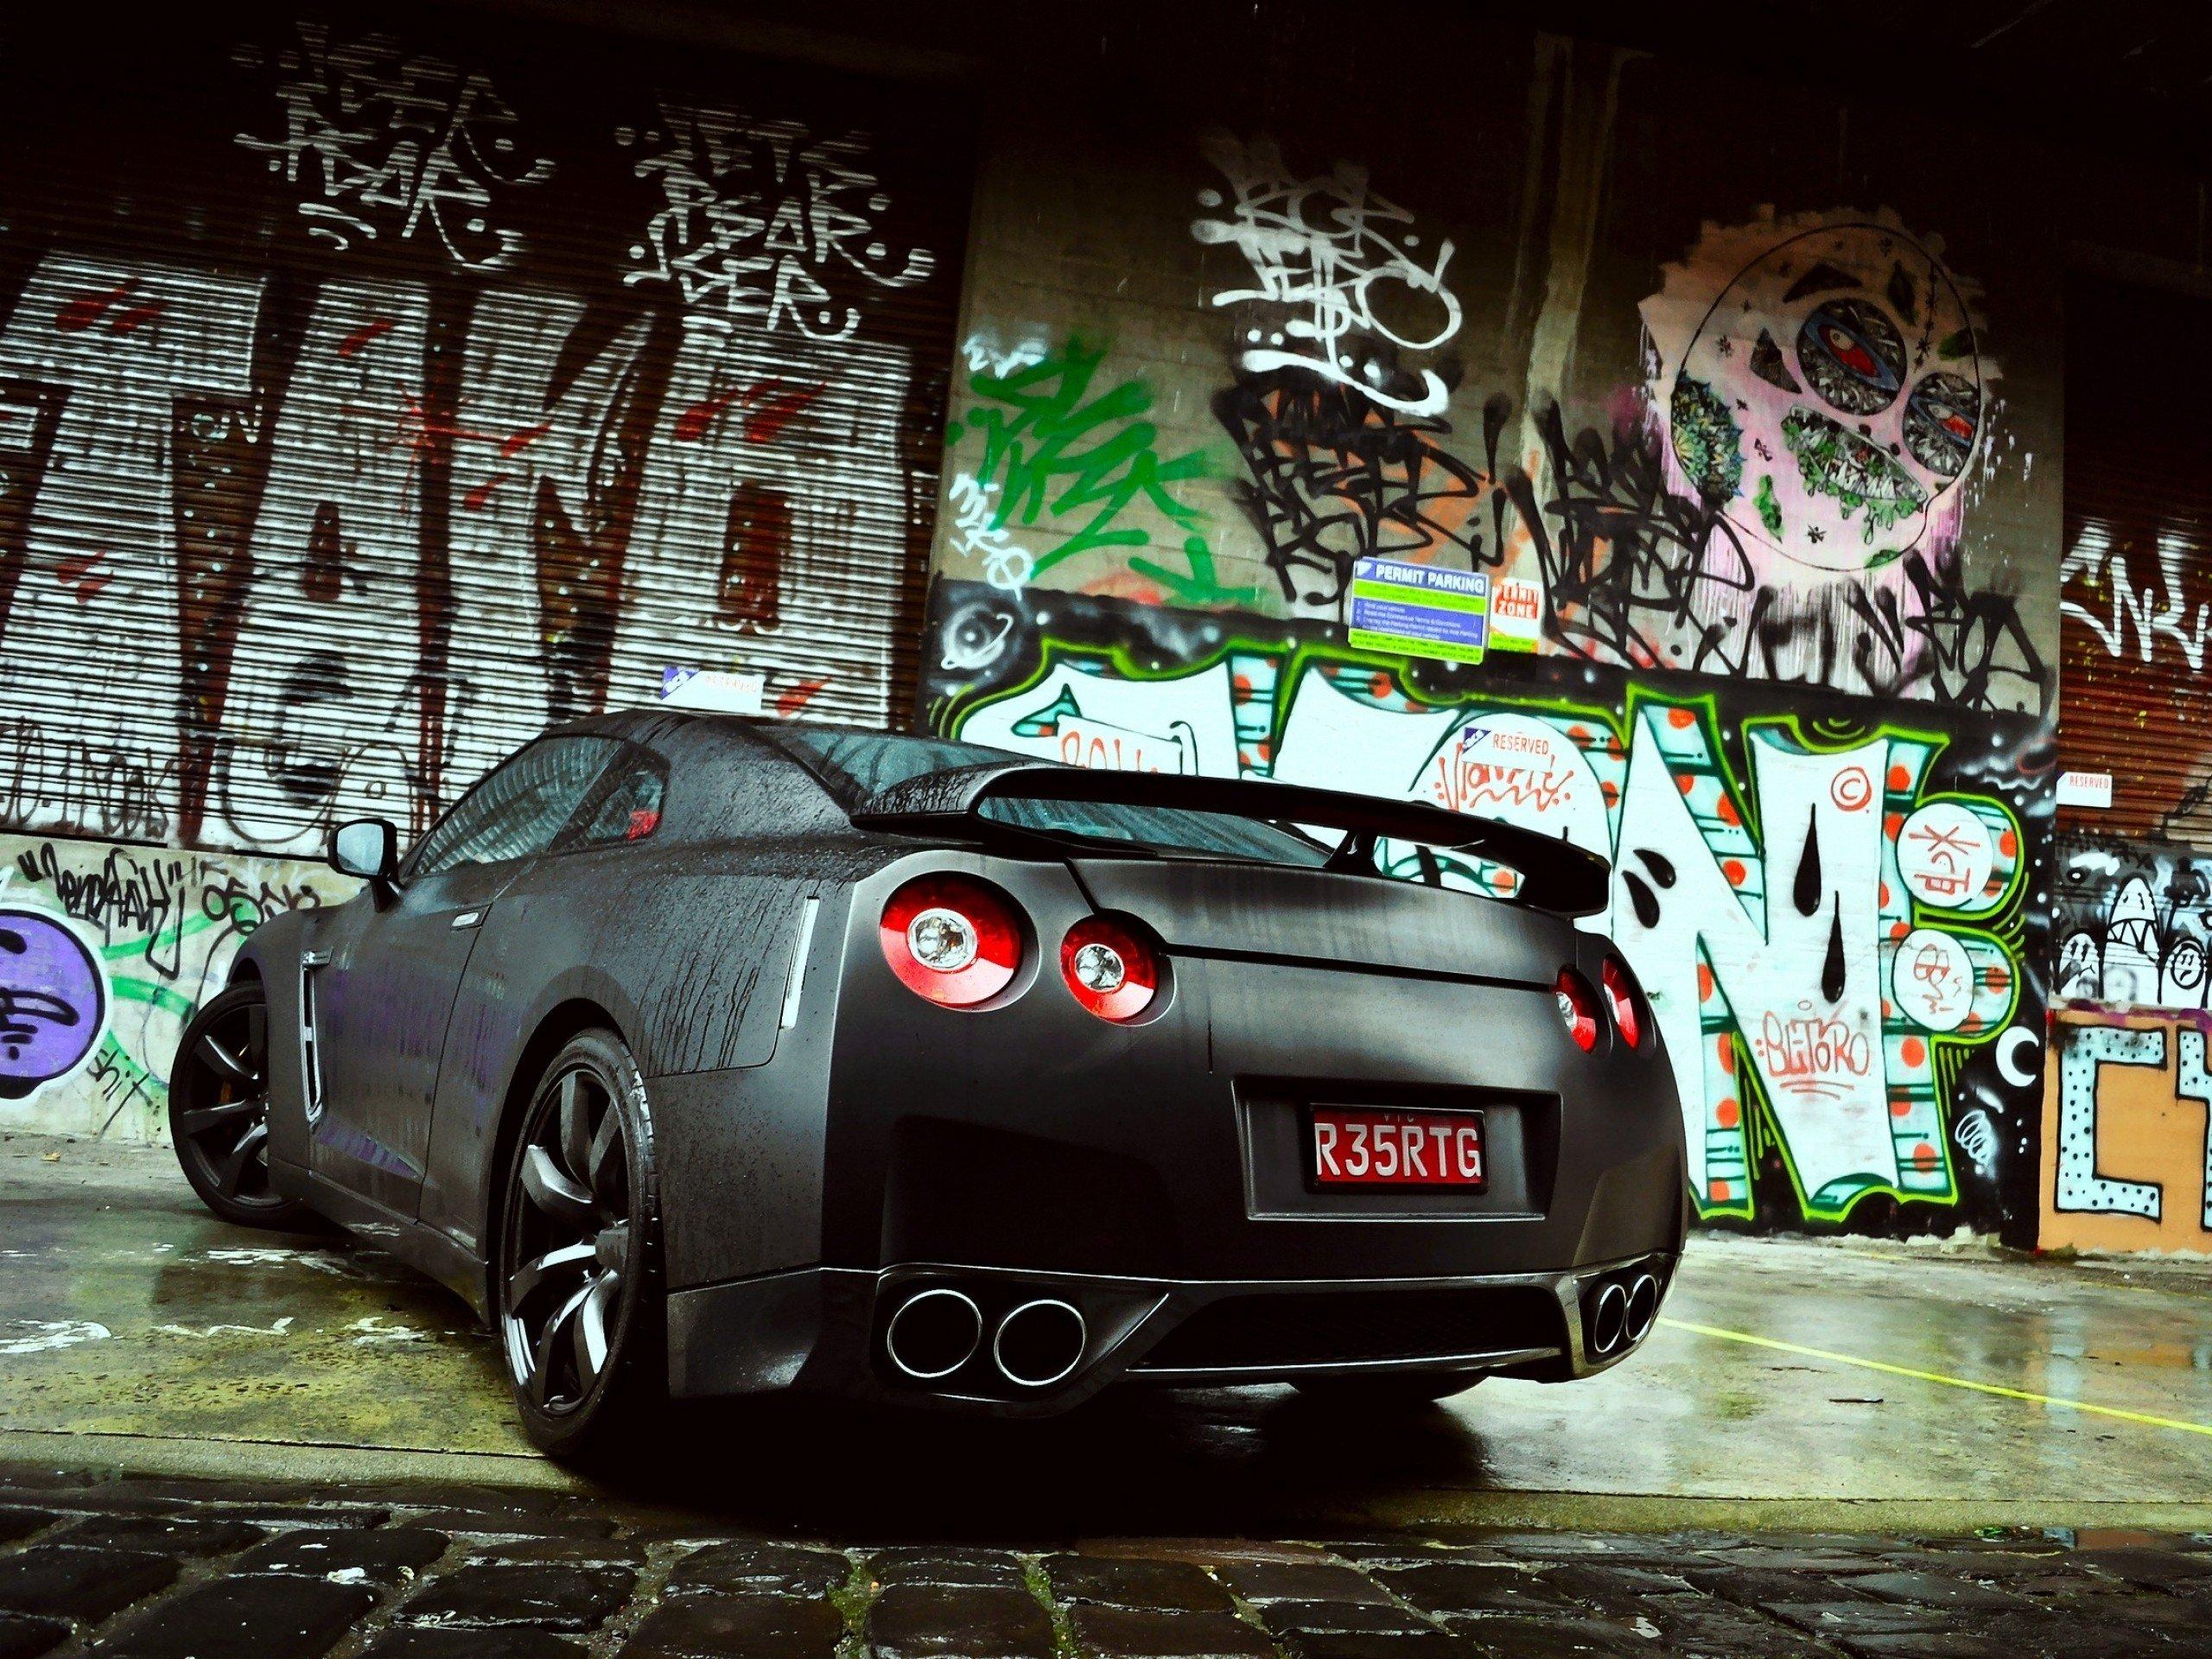 wall cars graffiti nissan matte nissan gtr wallpaper | 2560x1920